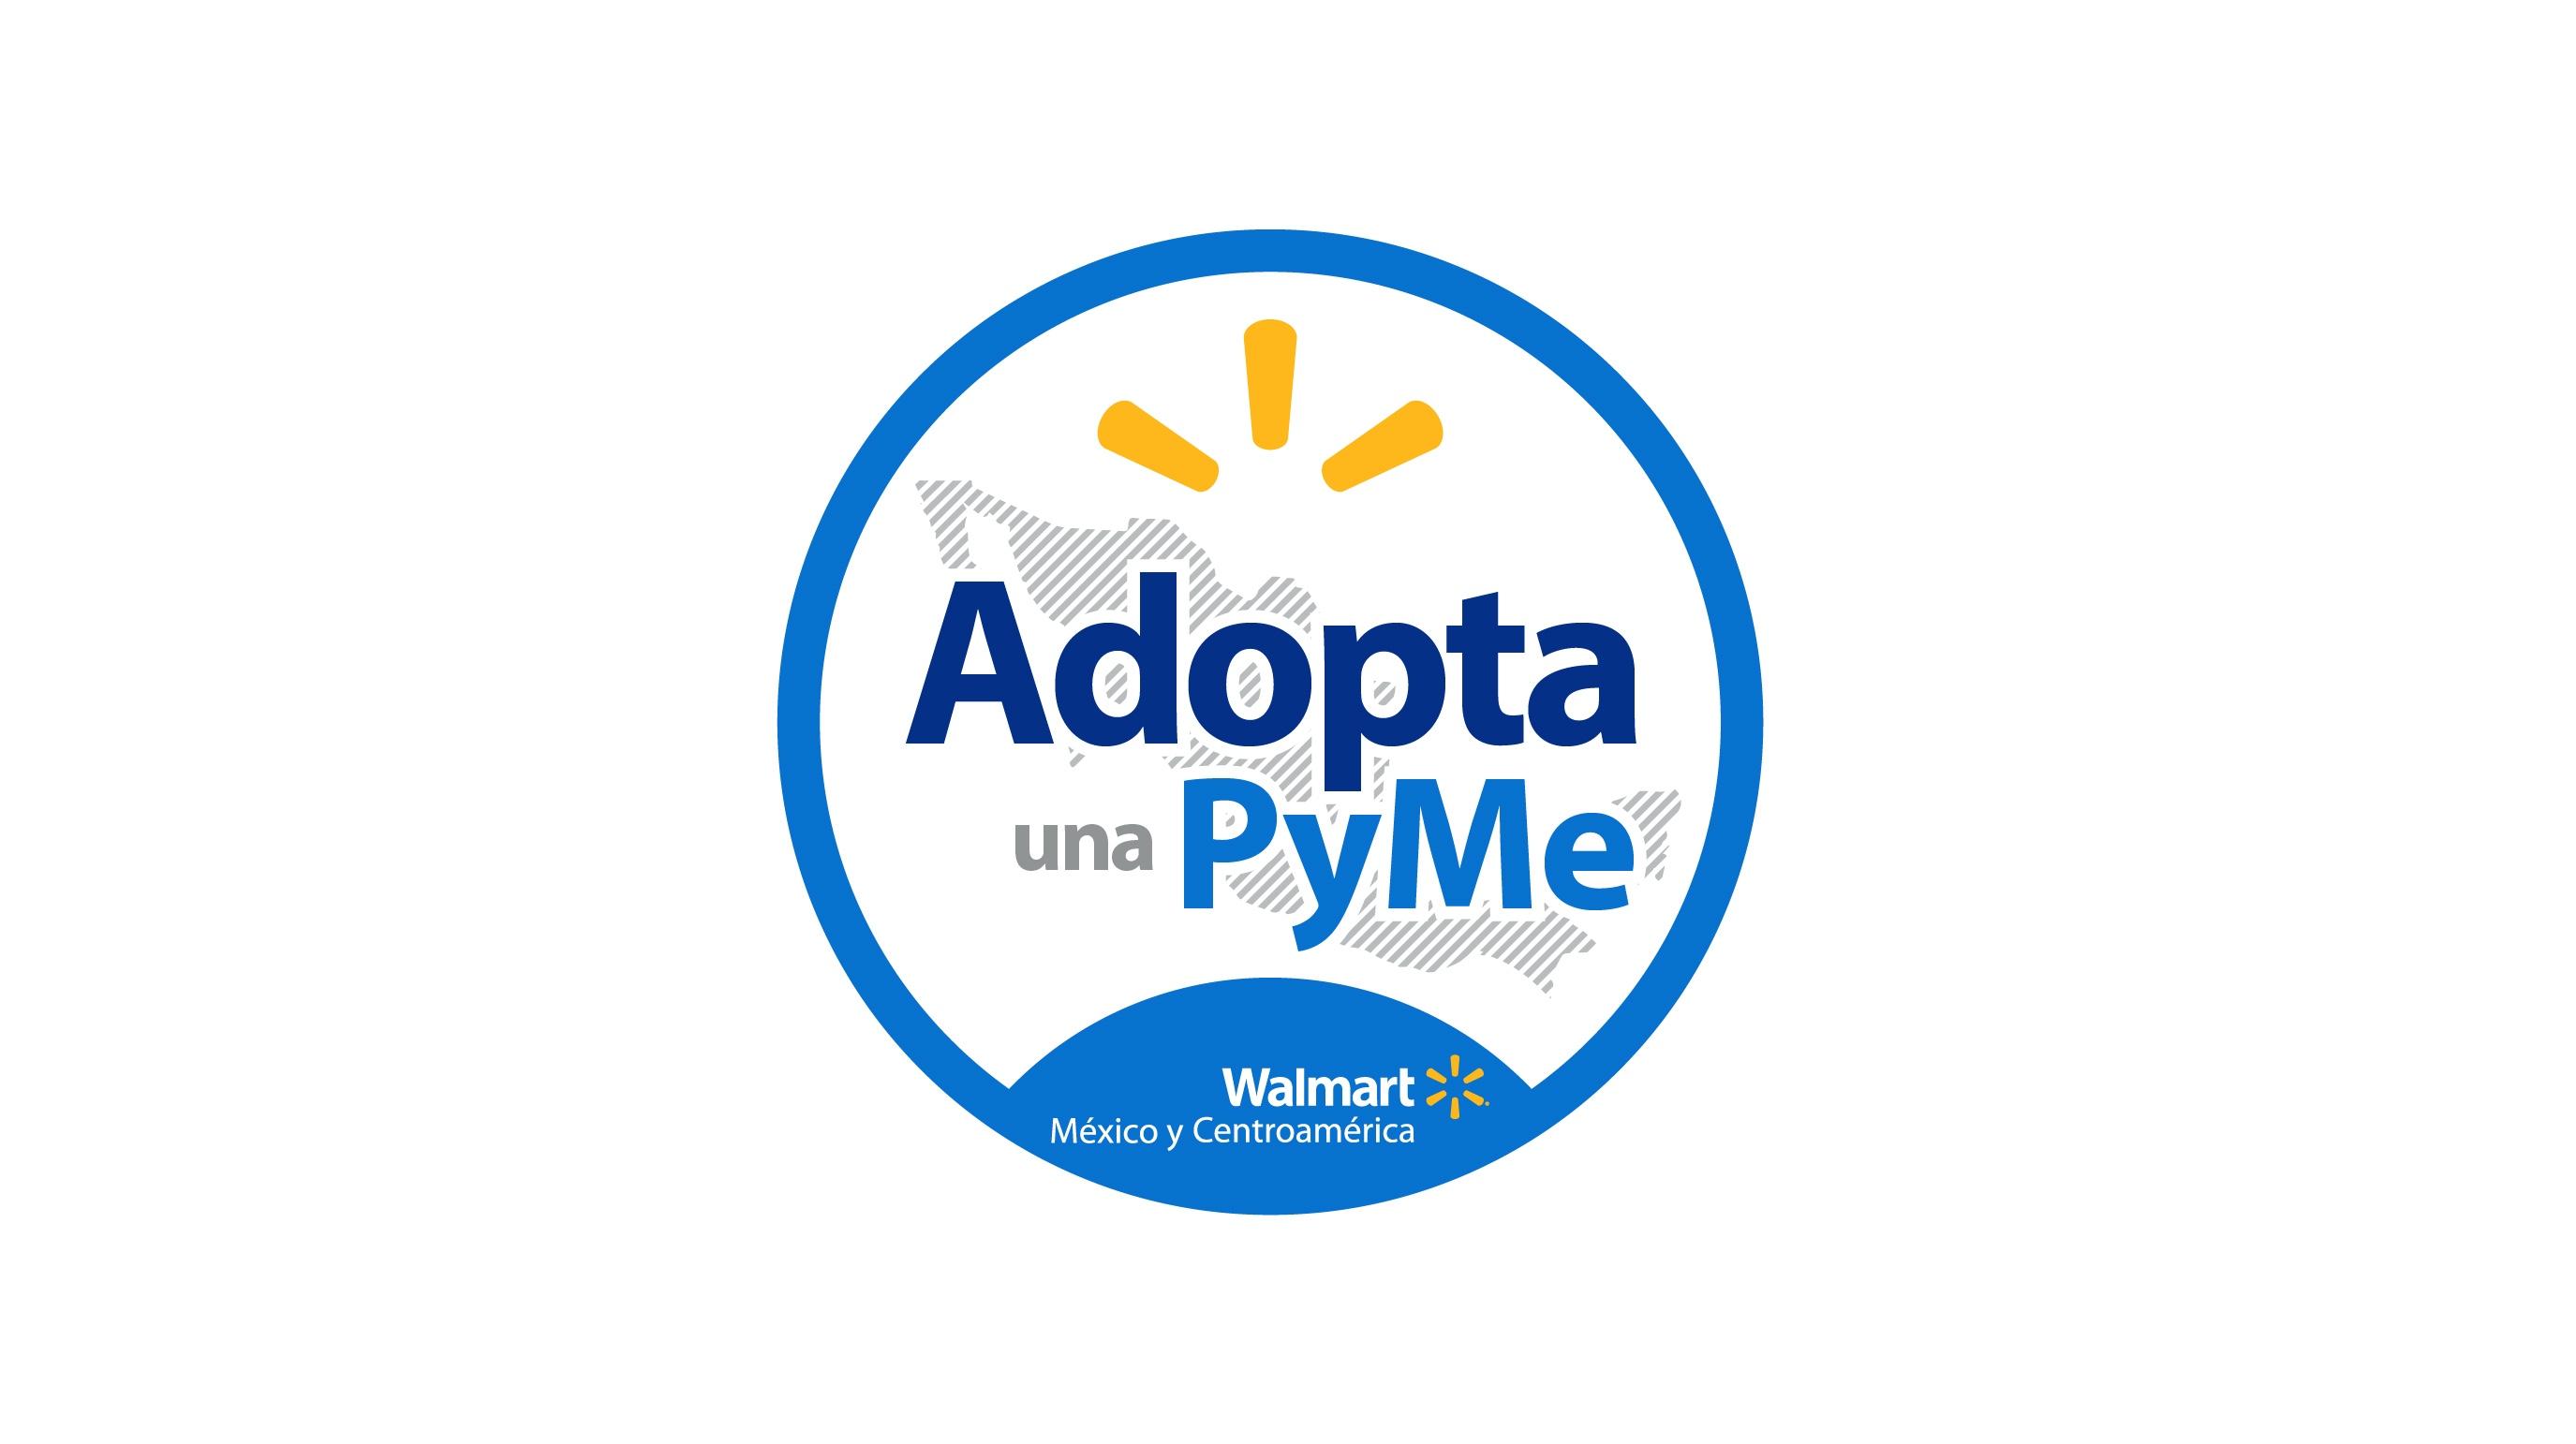 Adopta una Pyme